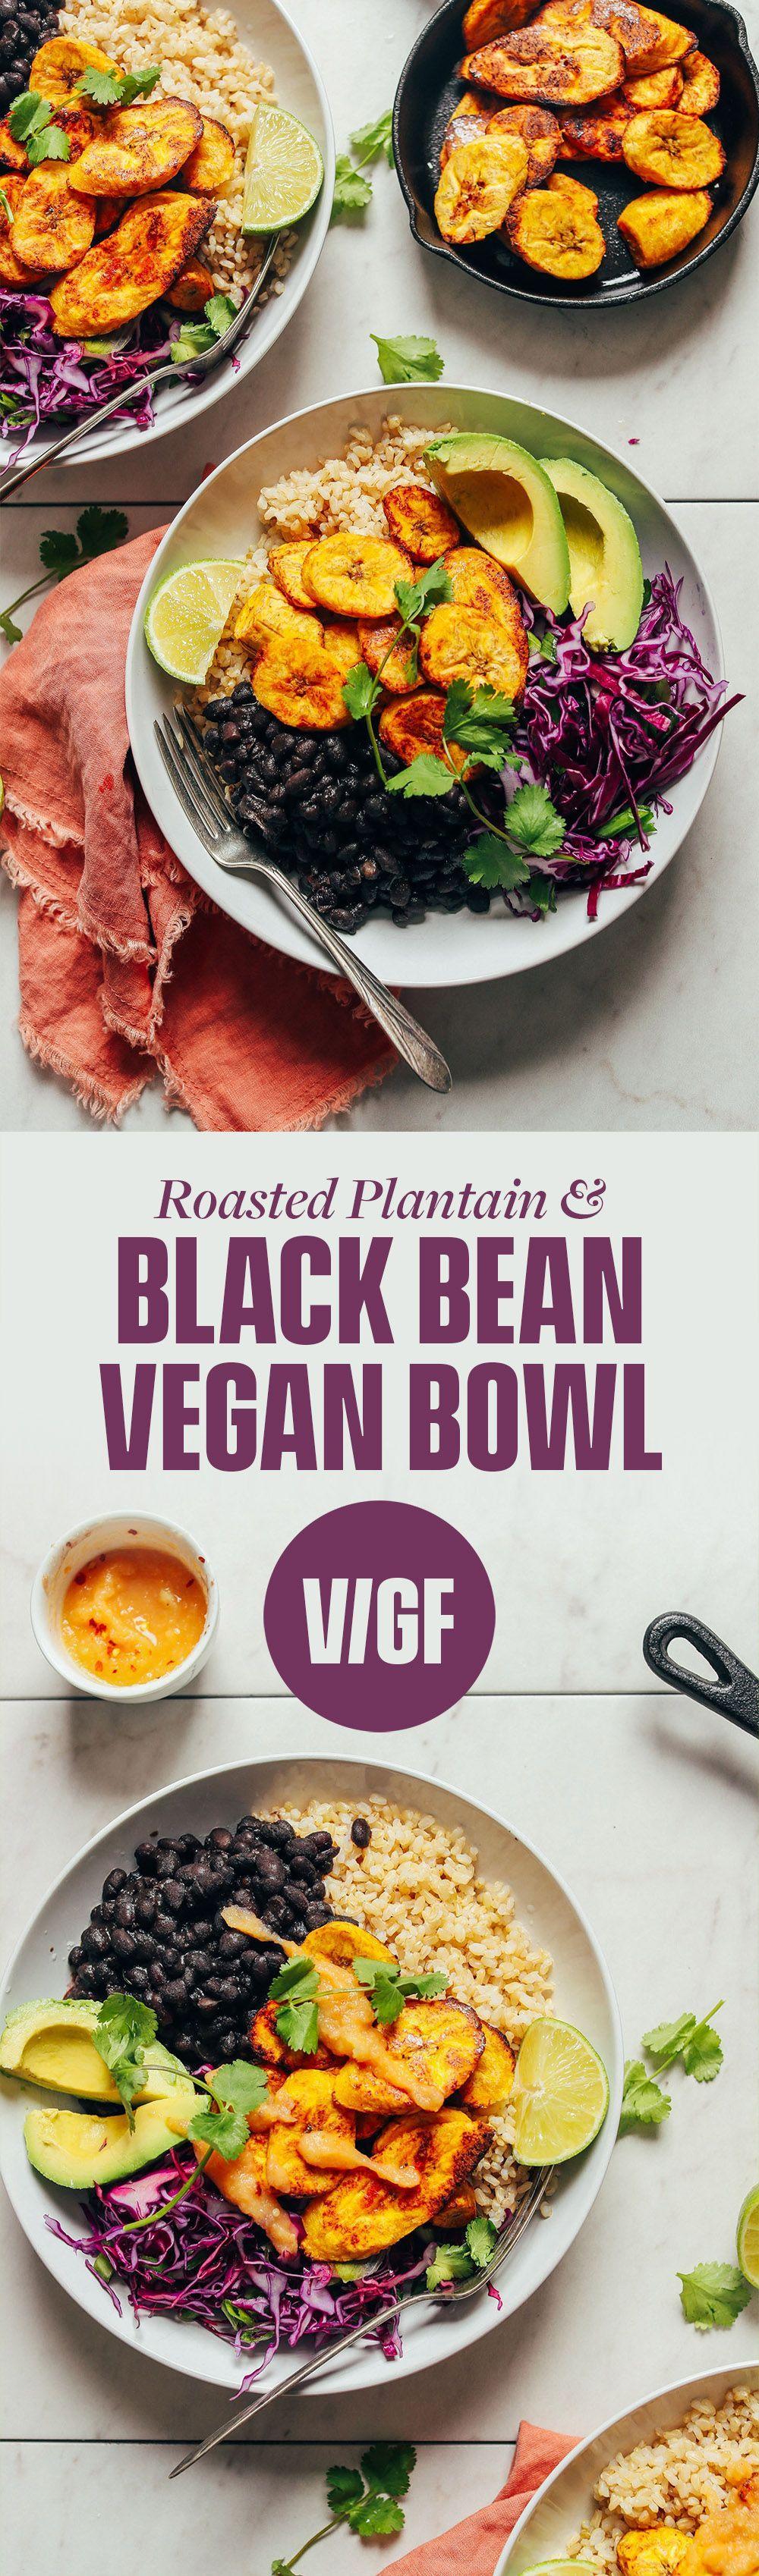 Bean Plantain Vegan Bowl DELICIOUS Black Bean Plantain Bowls! 10 healthy ingredients, BIG flavor, SO satisfying!DELICIOUS Black Bean Plantain Bowls! 10 healthy ingredients, BIG flavor, SO satisfying!